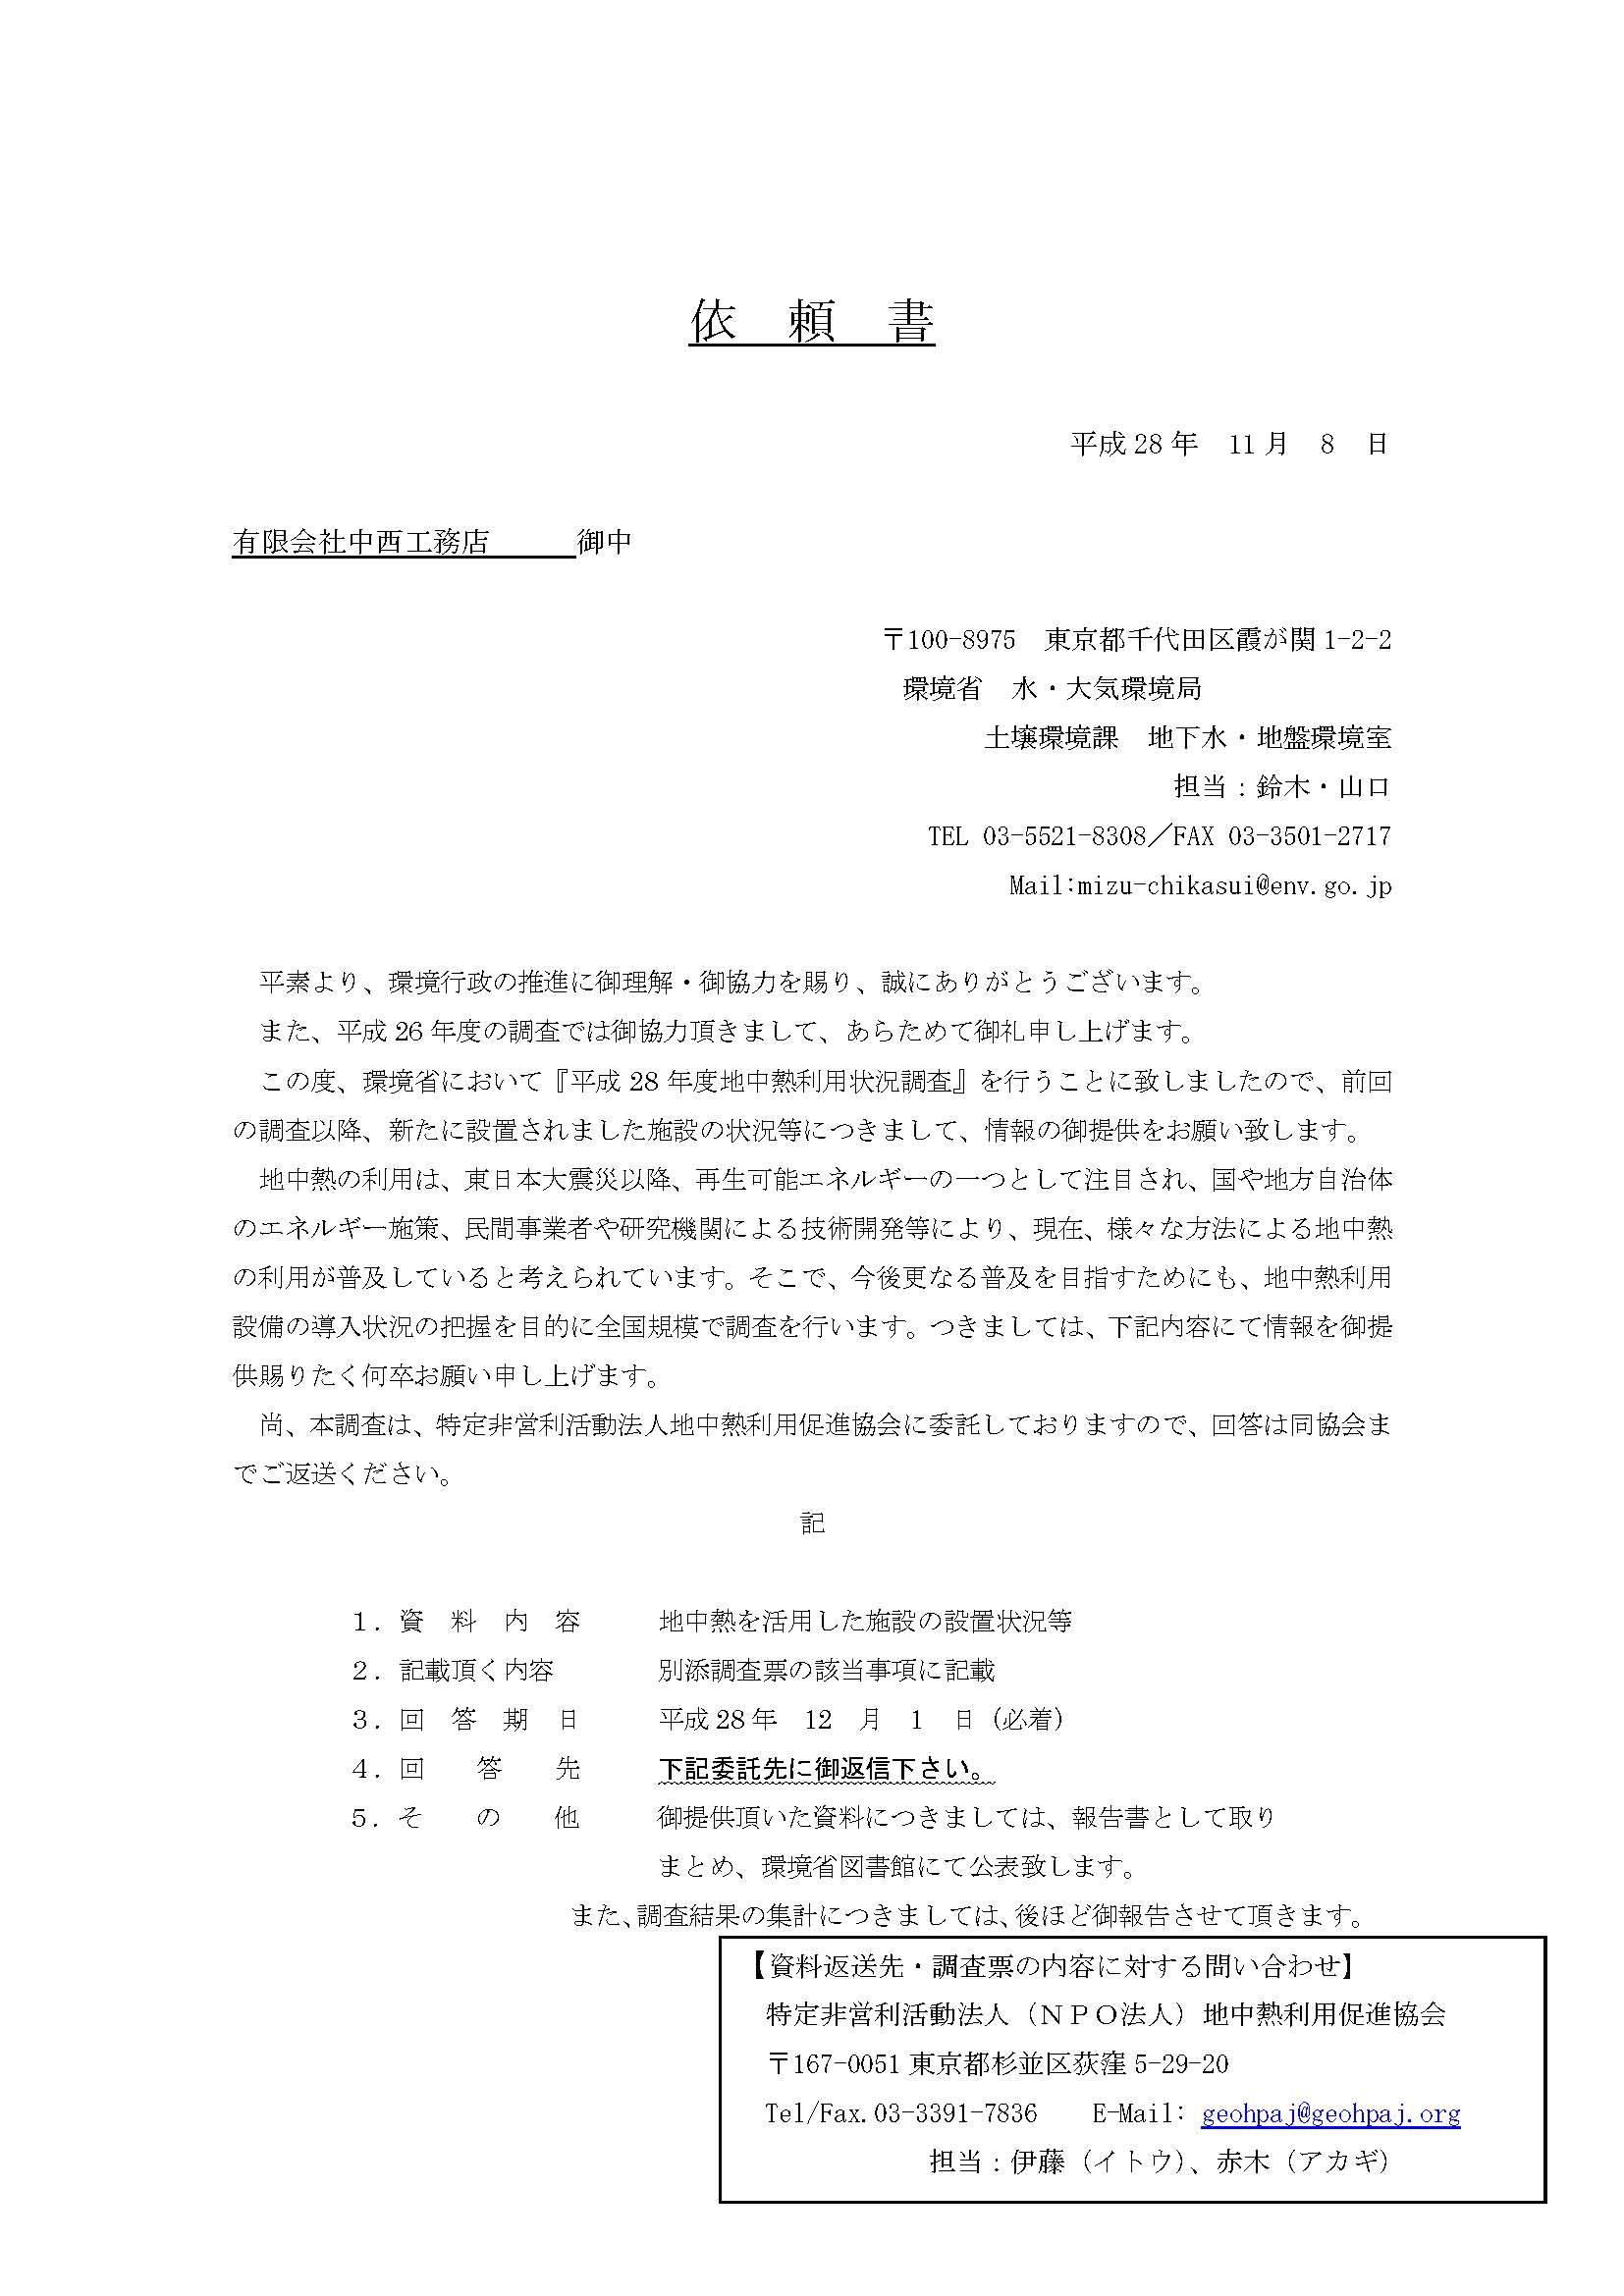 環境省依頼フォーム(再依頼).jpg